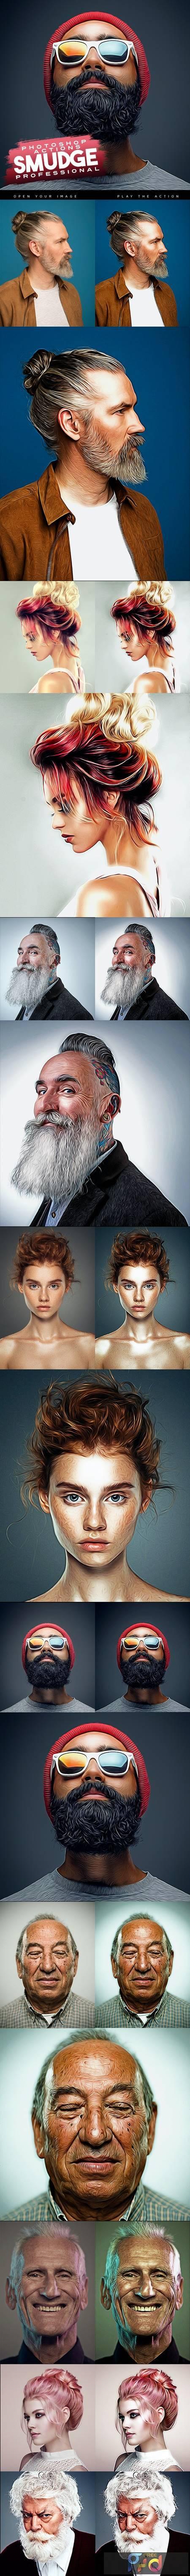 Smudge Professional Photoshop Actions 25891288 1